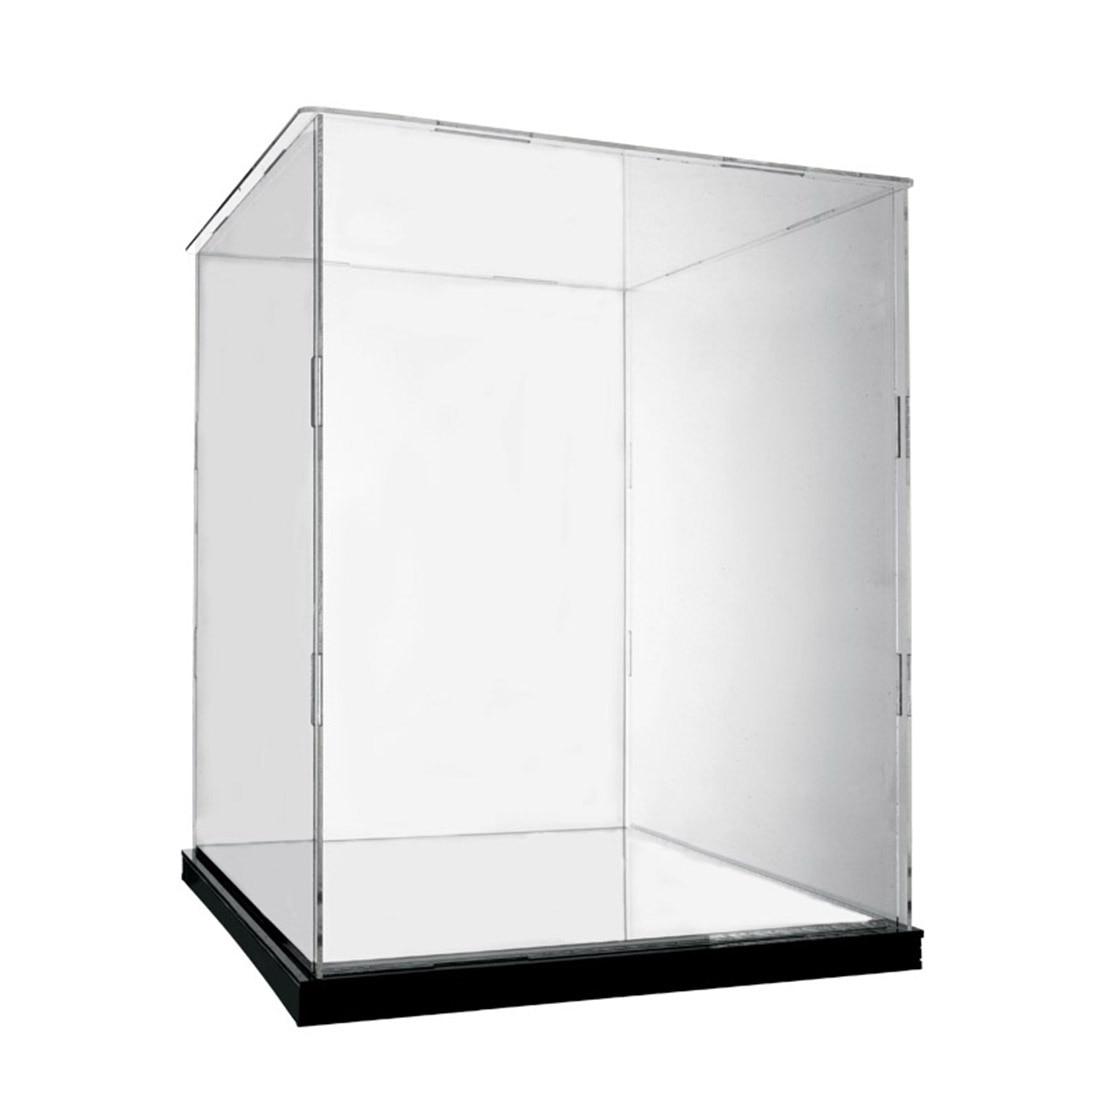 caixa de exibicao dustproof acrilica do bloco 01